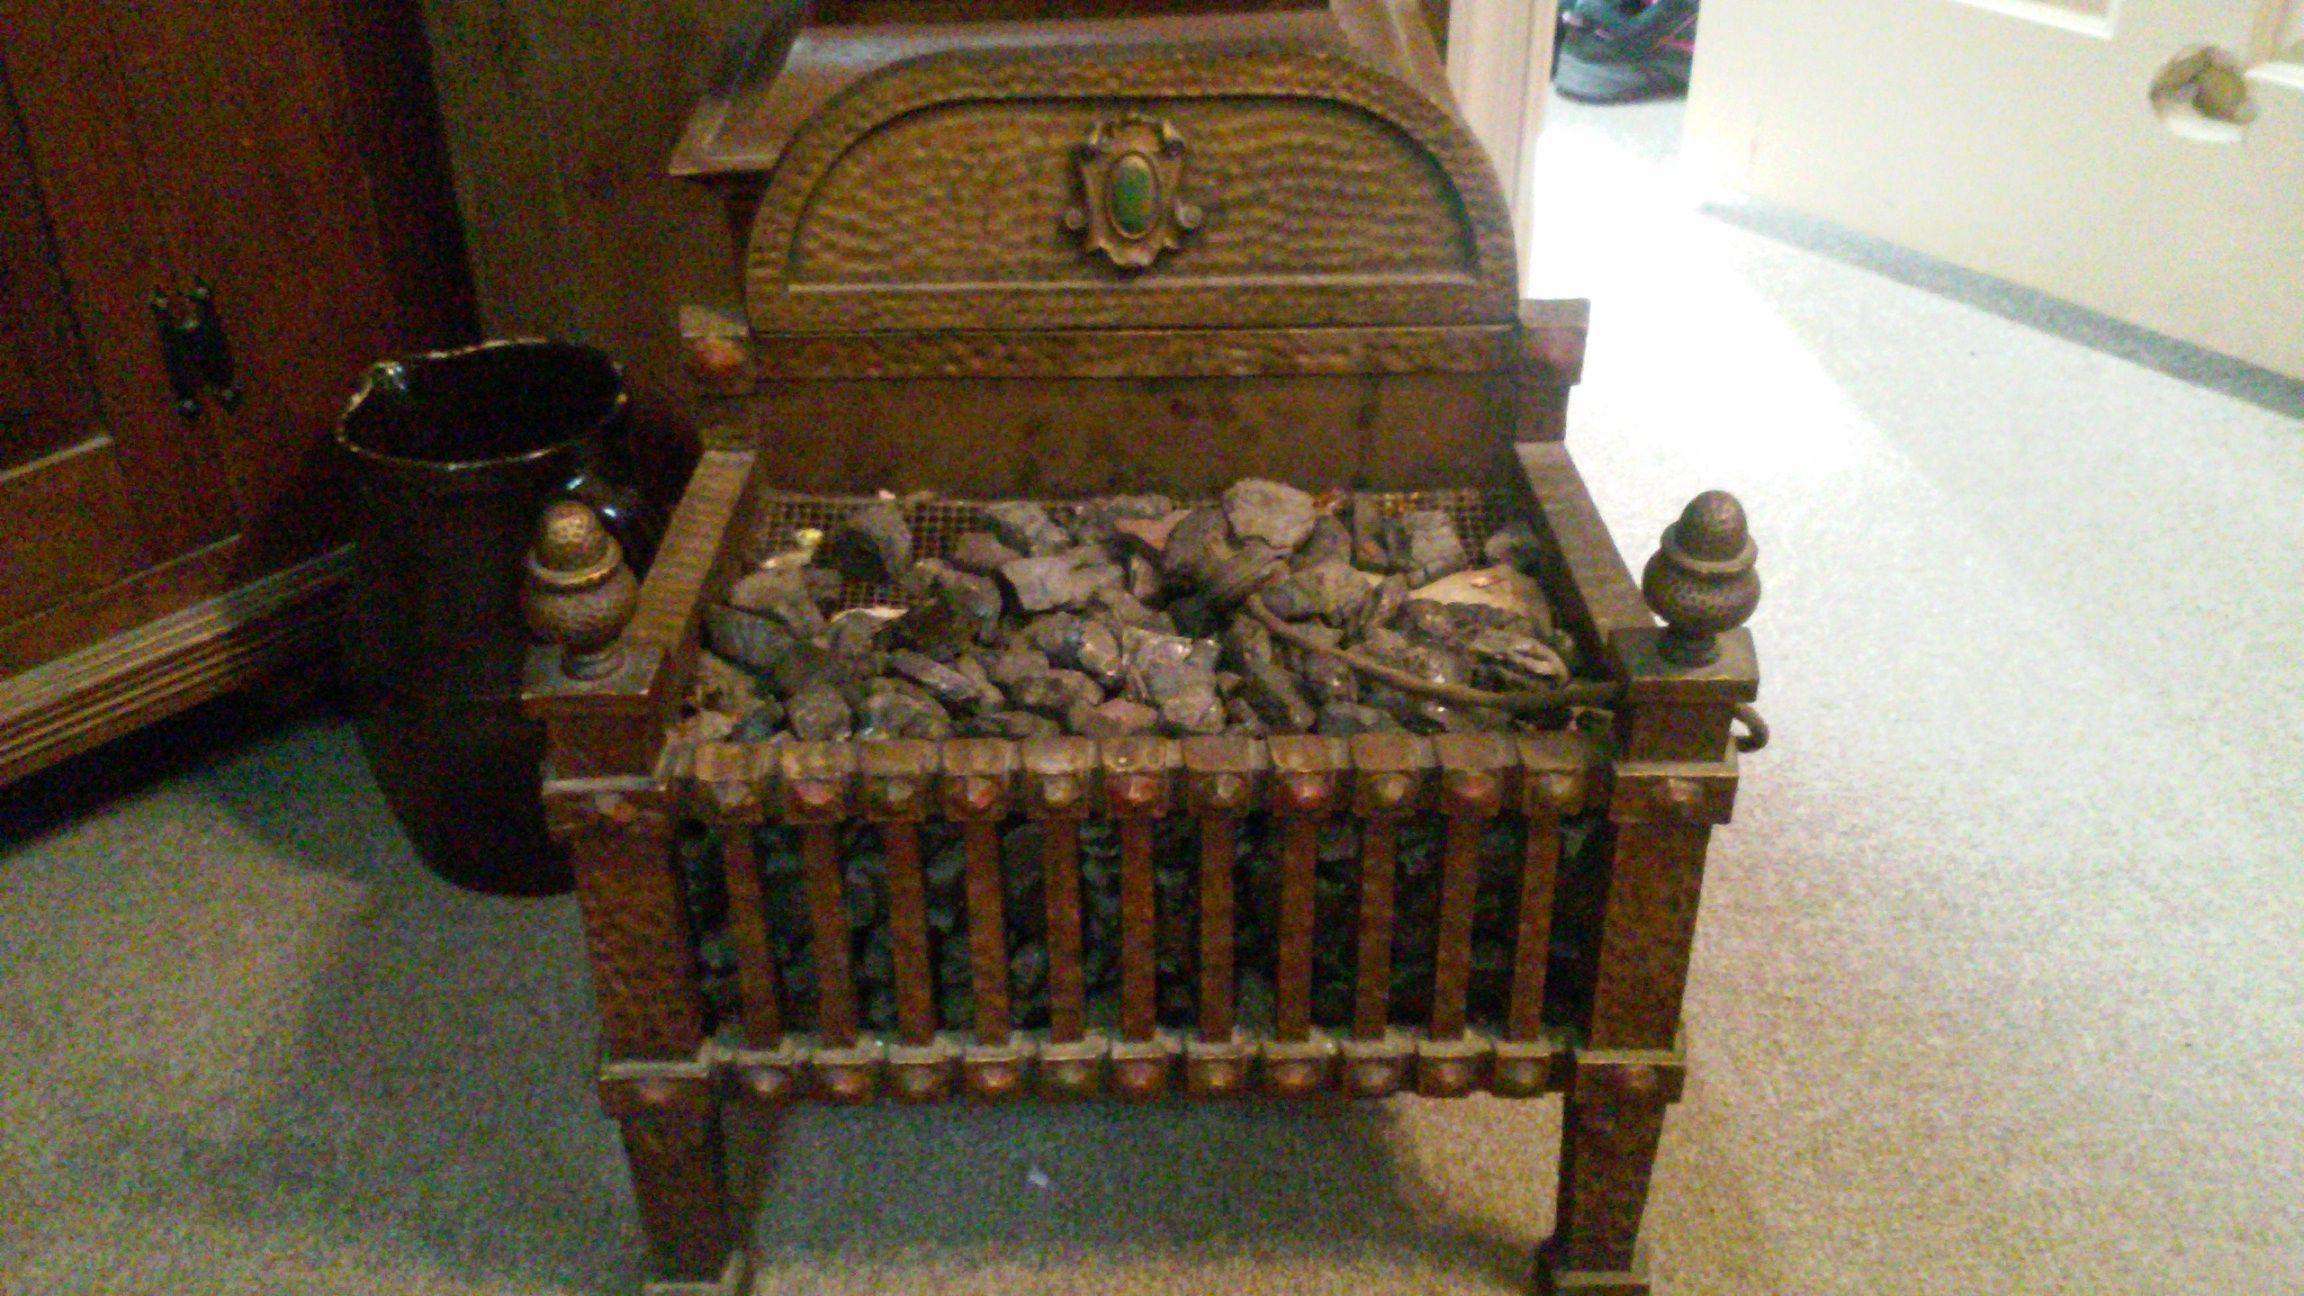 http www instappraisal com appraisal vintage electrical fireplace